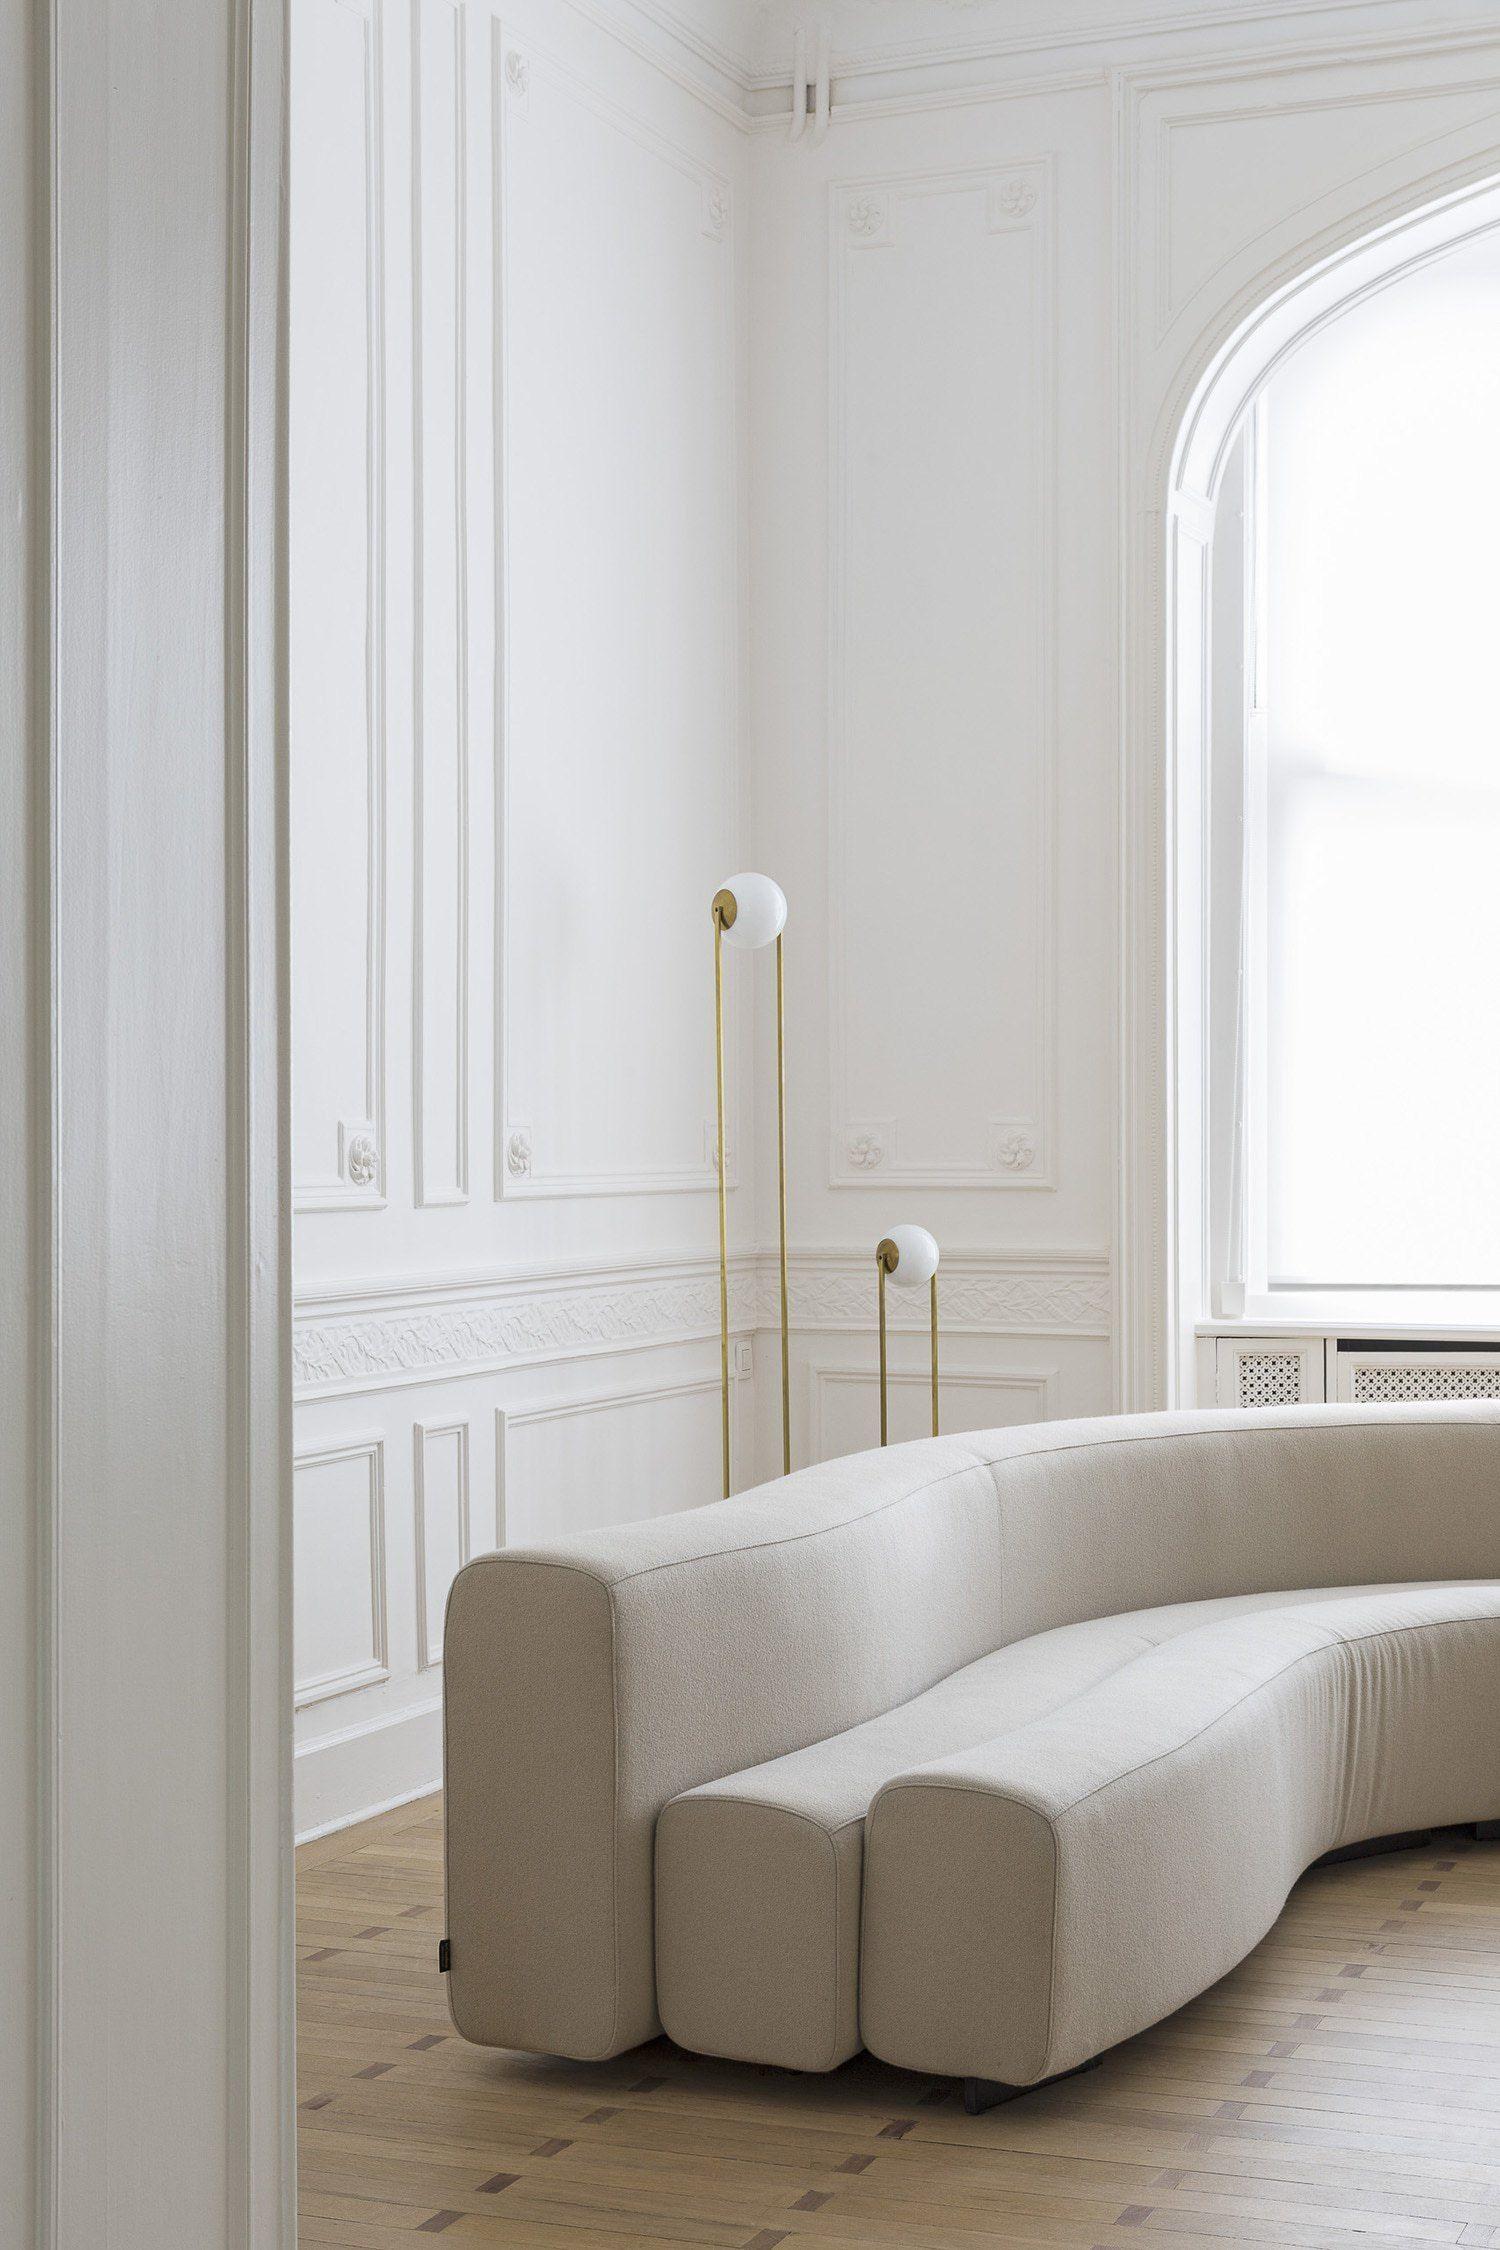 Van gend residence u minimalissimo minimal houses in